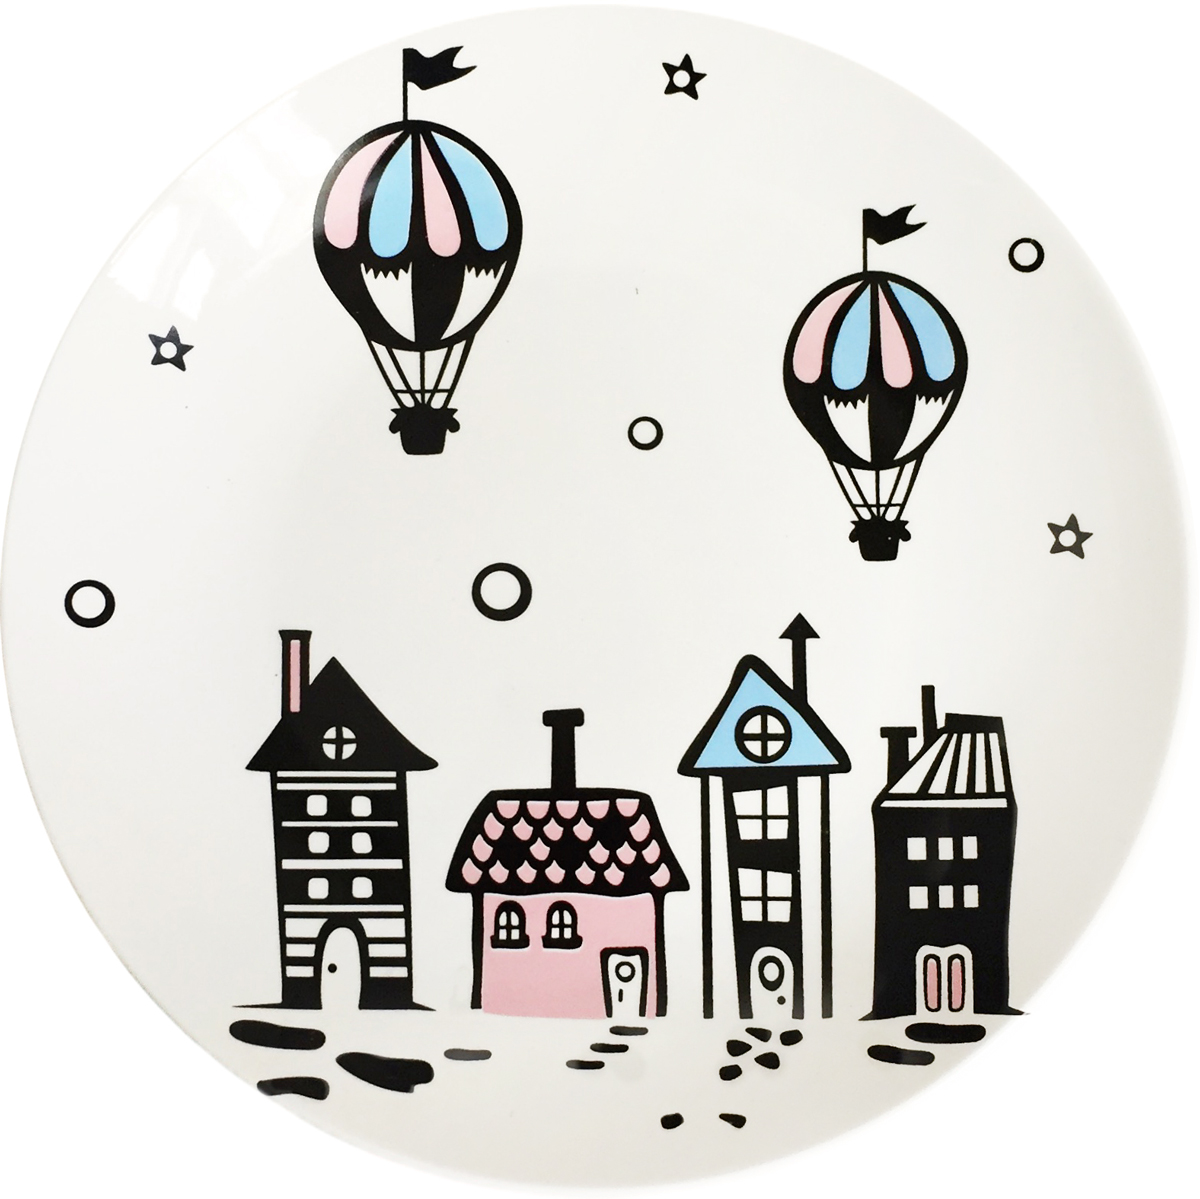 Тарелка Сотвори чудо Воздушный город, диаметр 22 см тарелка сотвори чудо город любви диаметр 22 см